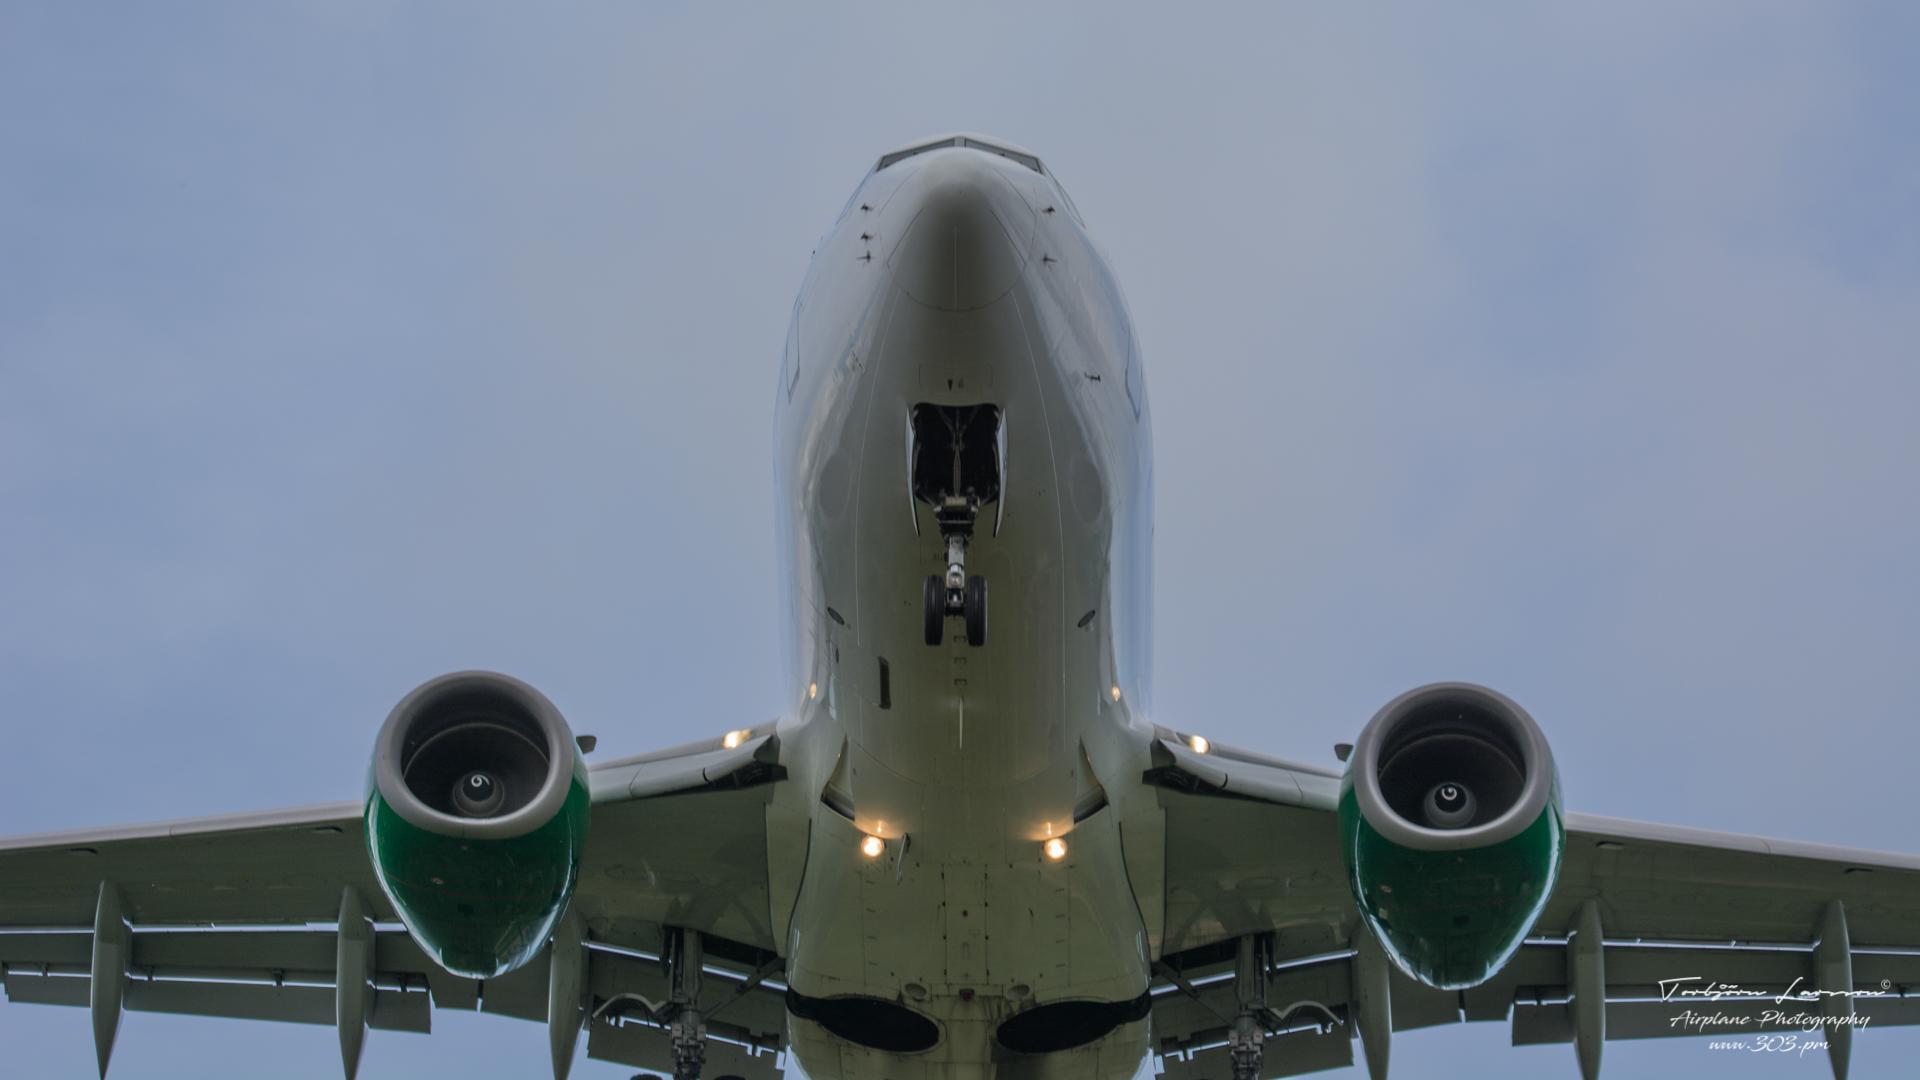 TBE_4338-Germania Boeing 737-700